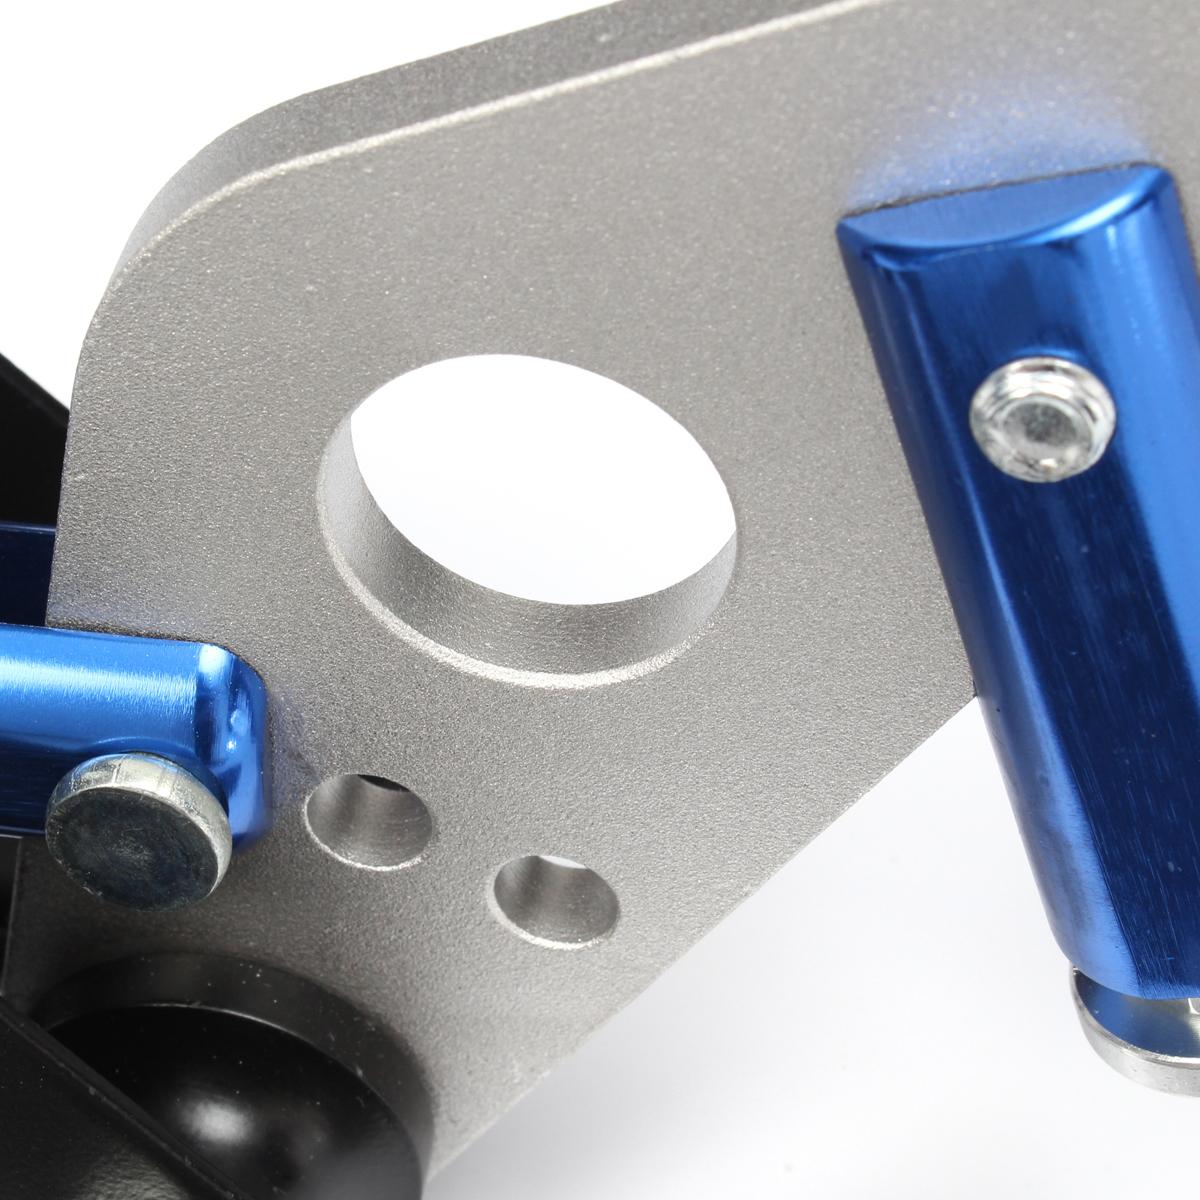 Hydraulic Horizontal Racing Drift Handbrake Hand Brake Parking Brake Lever Universal